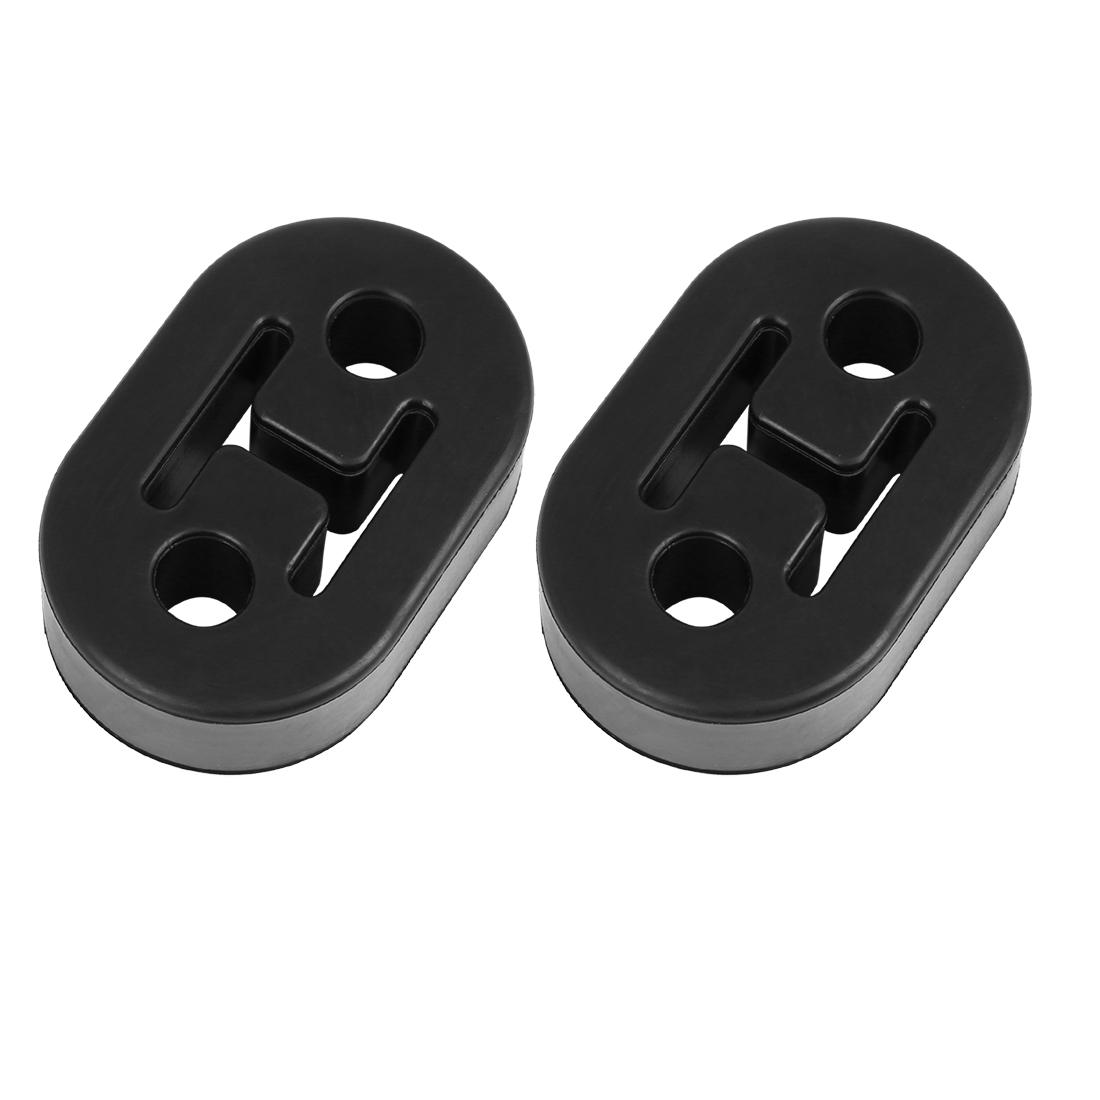 2pcs 2 Holes 12mm Dia Black EPDM Rubber Car Exhaust Hangers Bushing 73x47x21mm